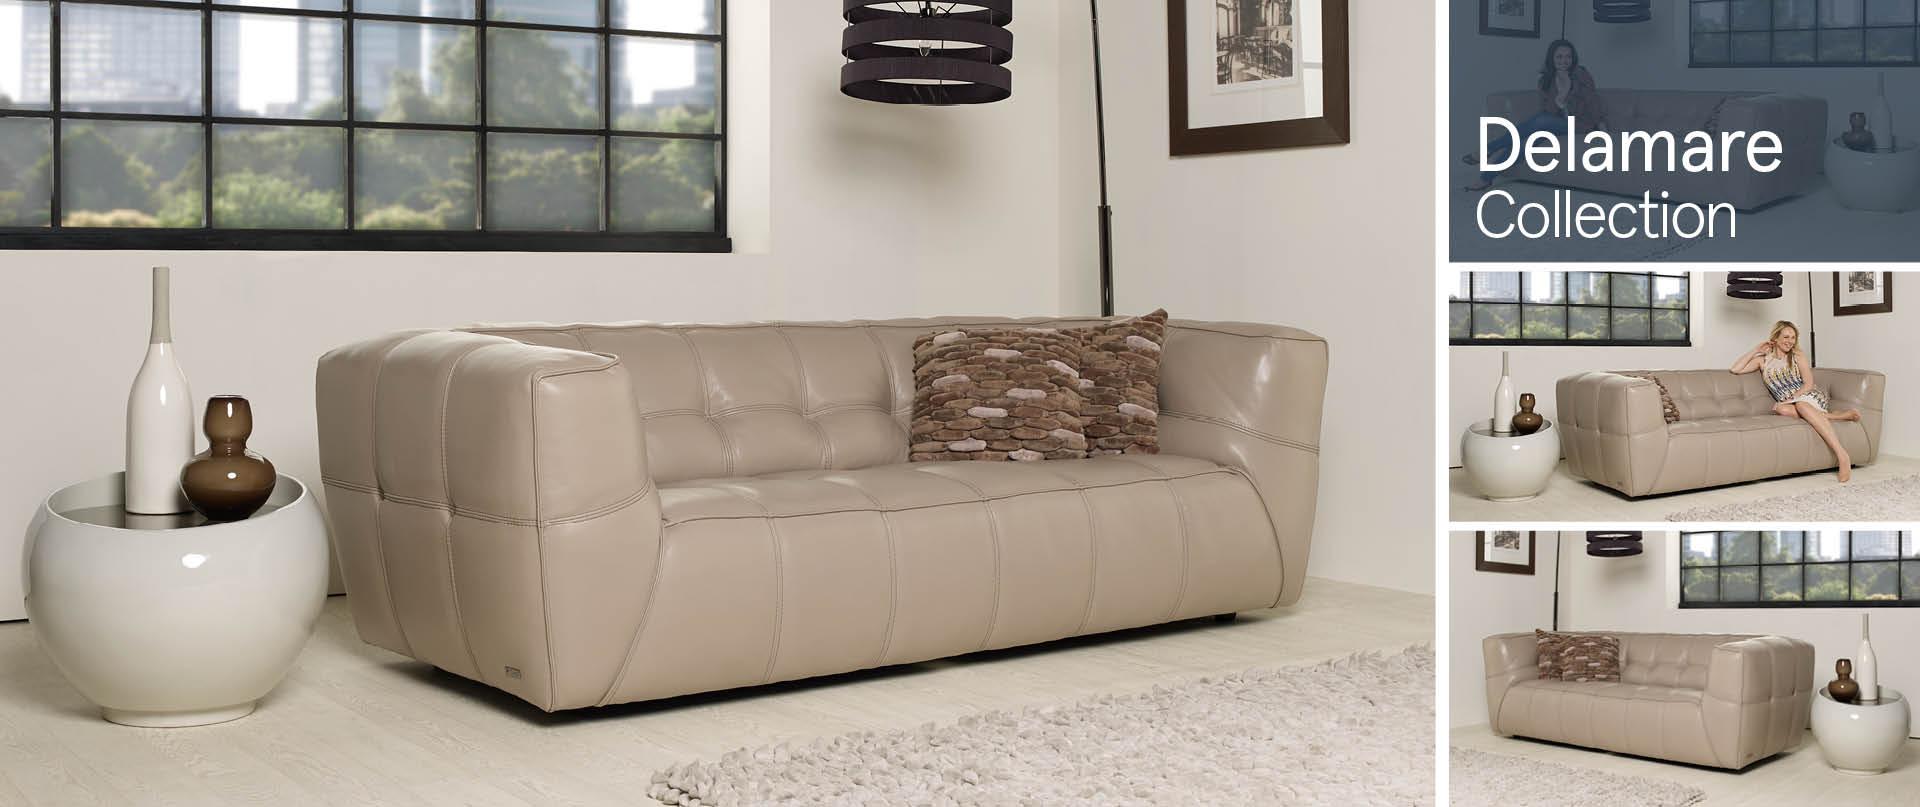 Delamare All Leather Sofa Ranges